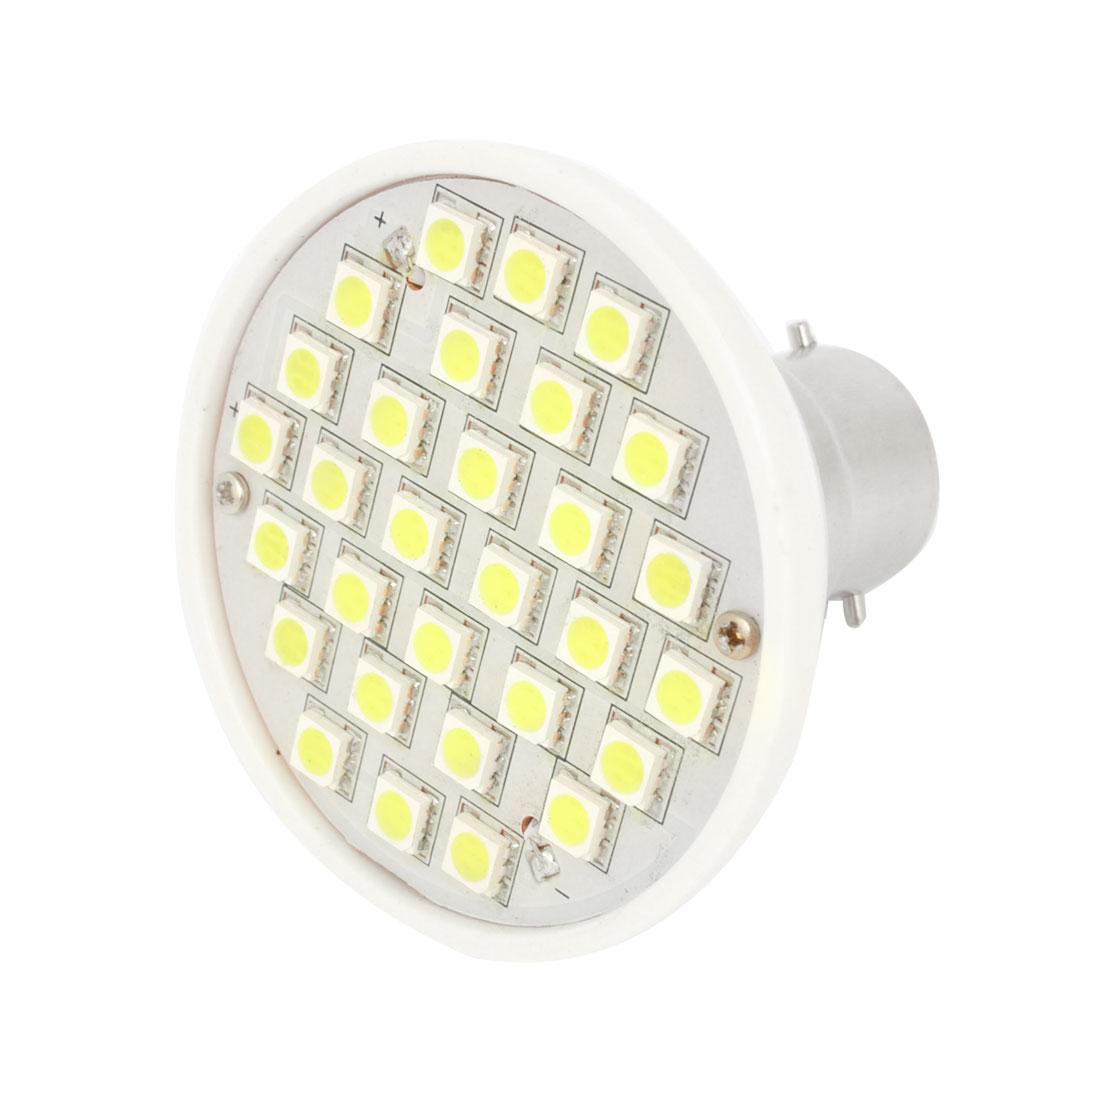 3W AC 220V White 3528 SMD 30 LED Energy Saving Light Spotlight Bulb B22